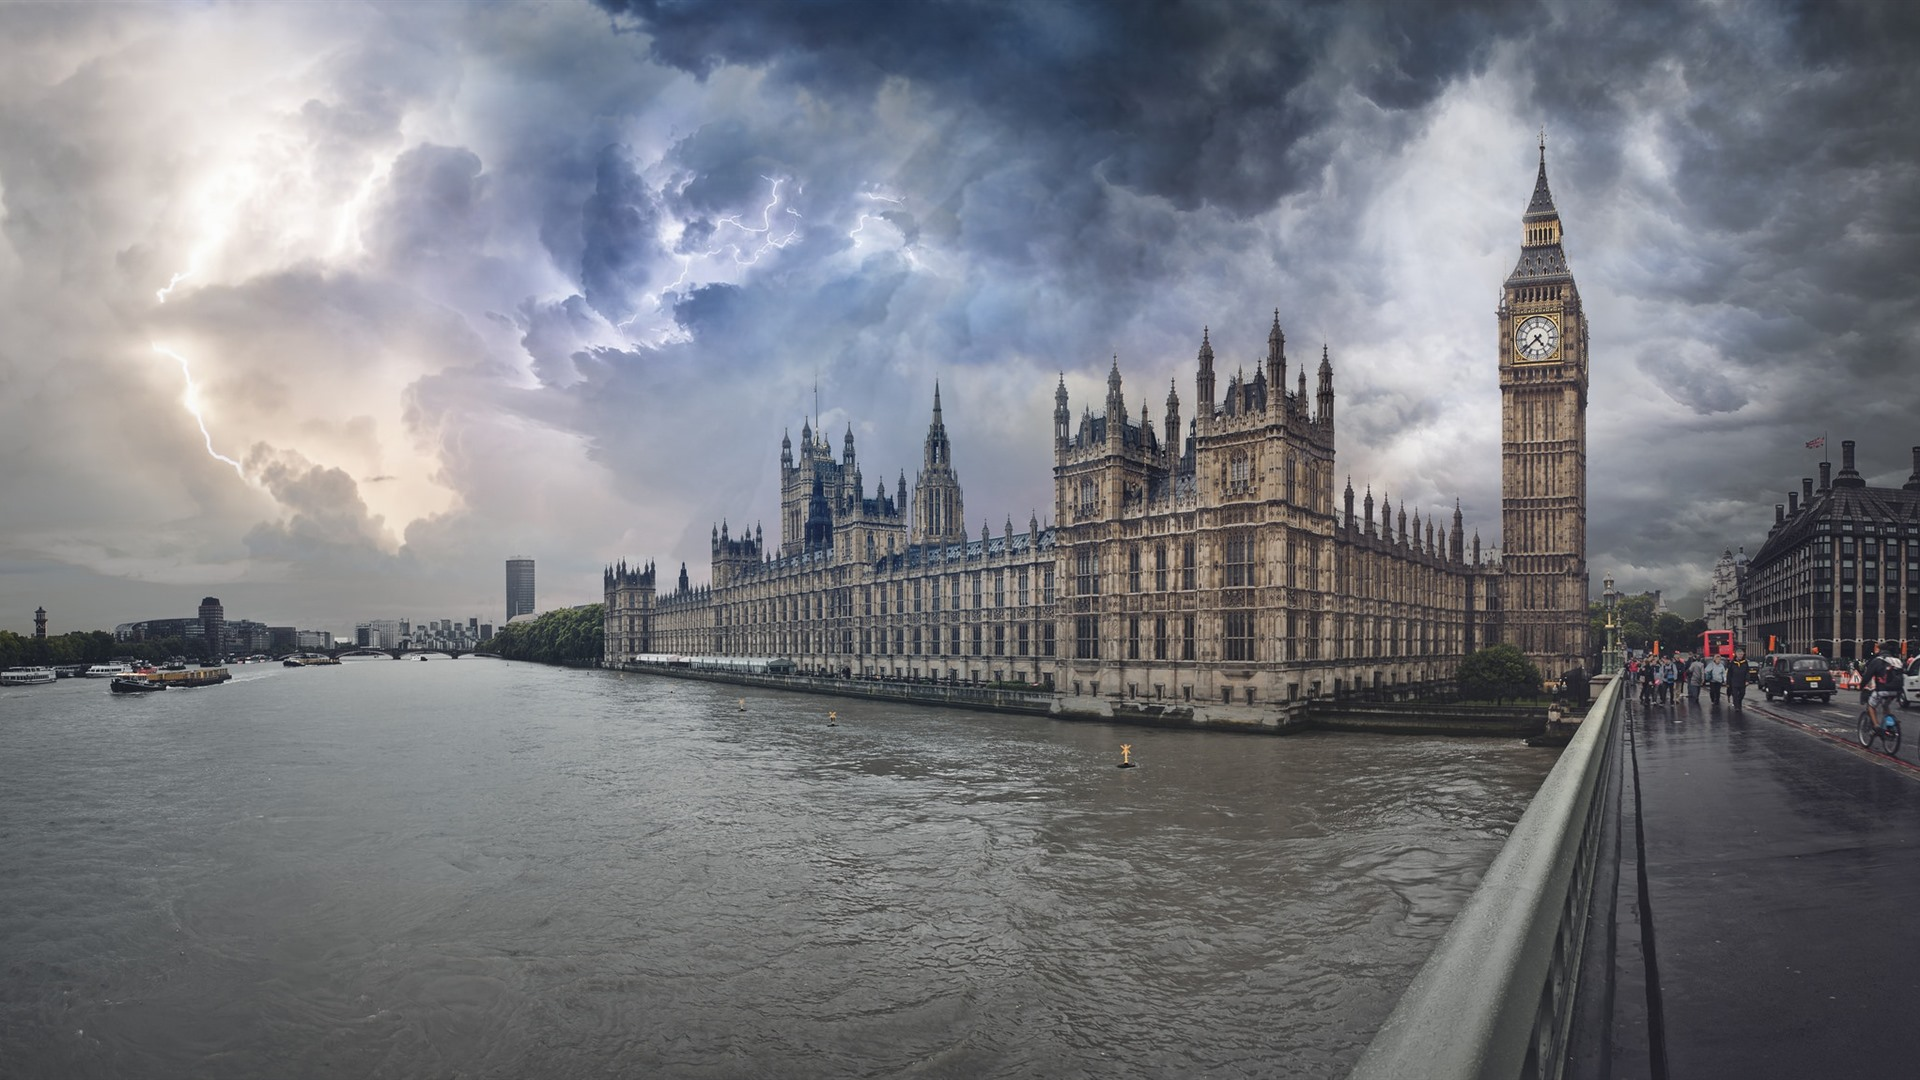 Wallpaper London Big Ben River Bridge Storm Lightning